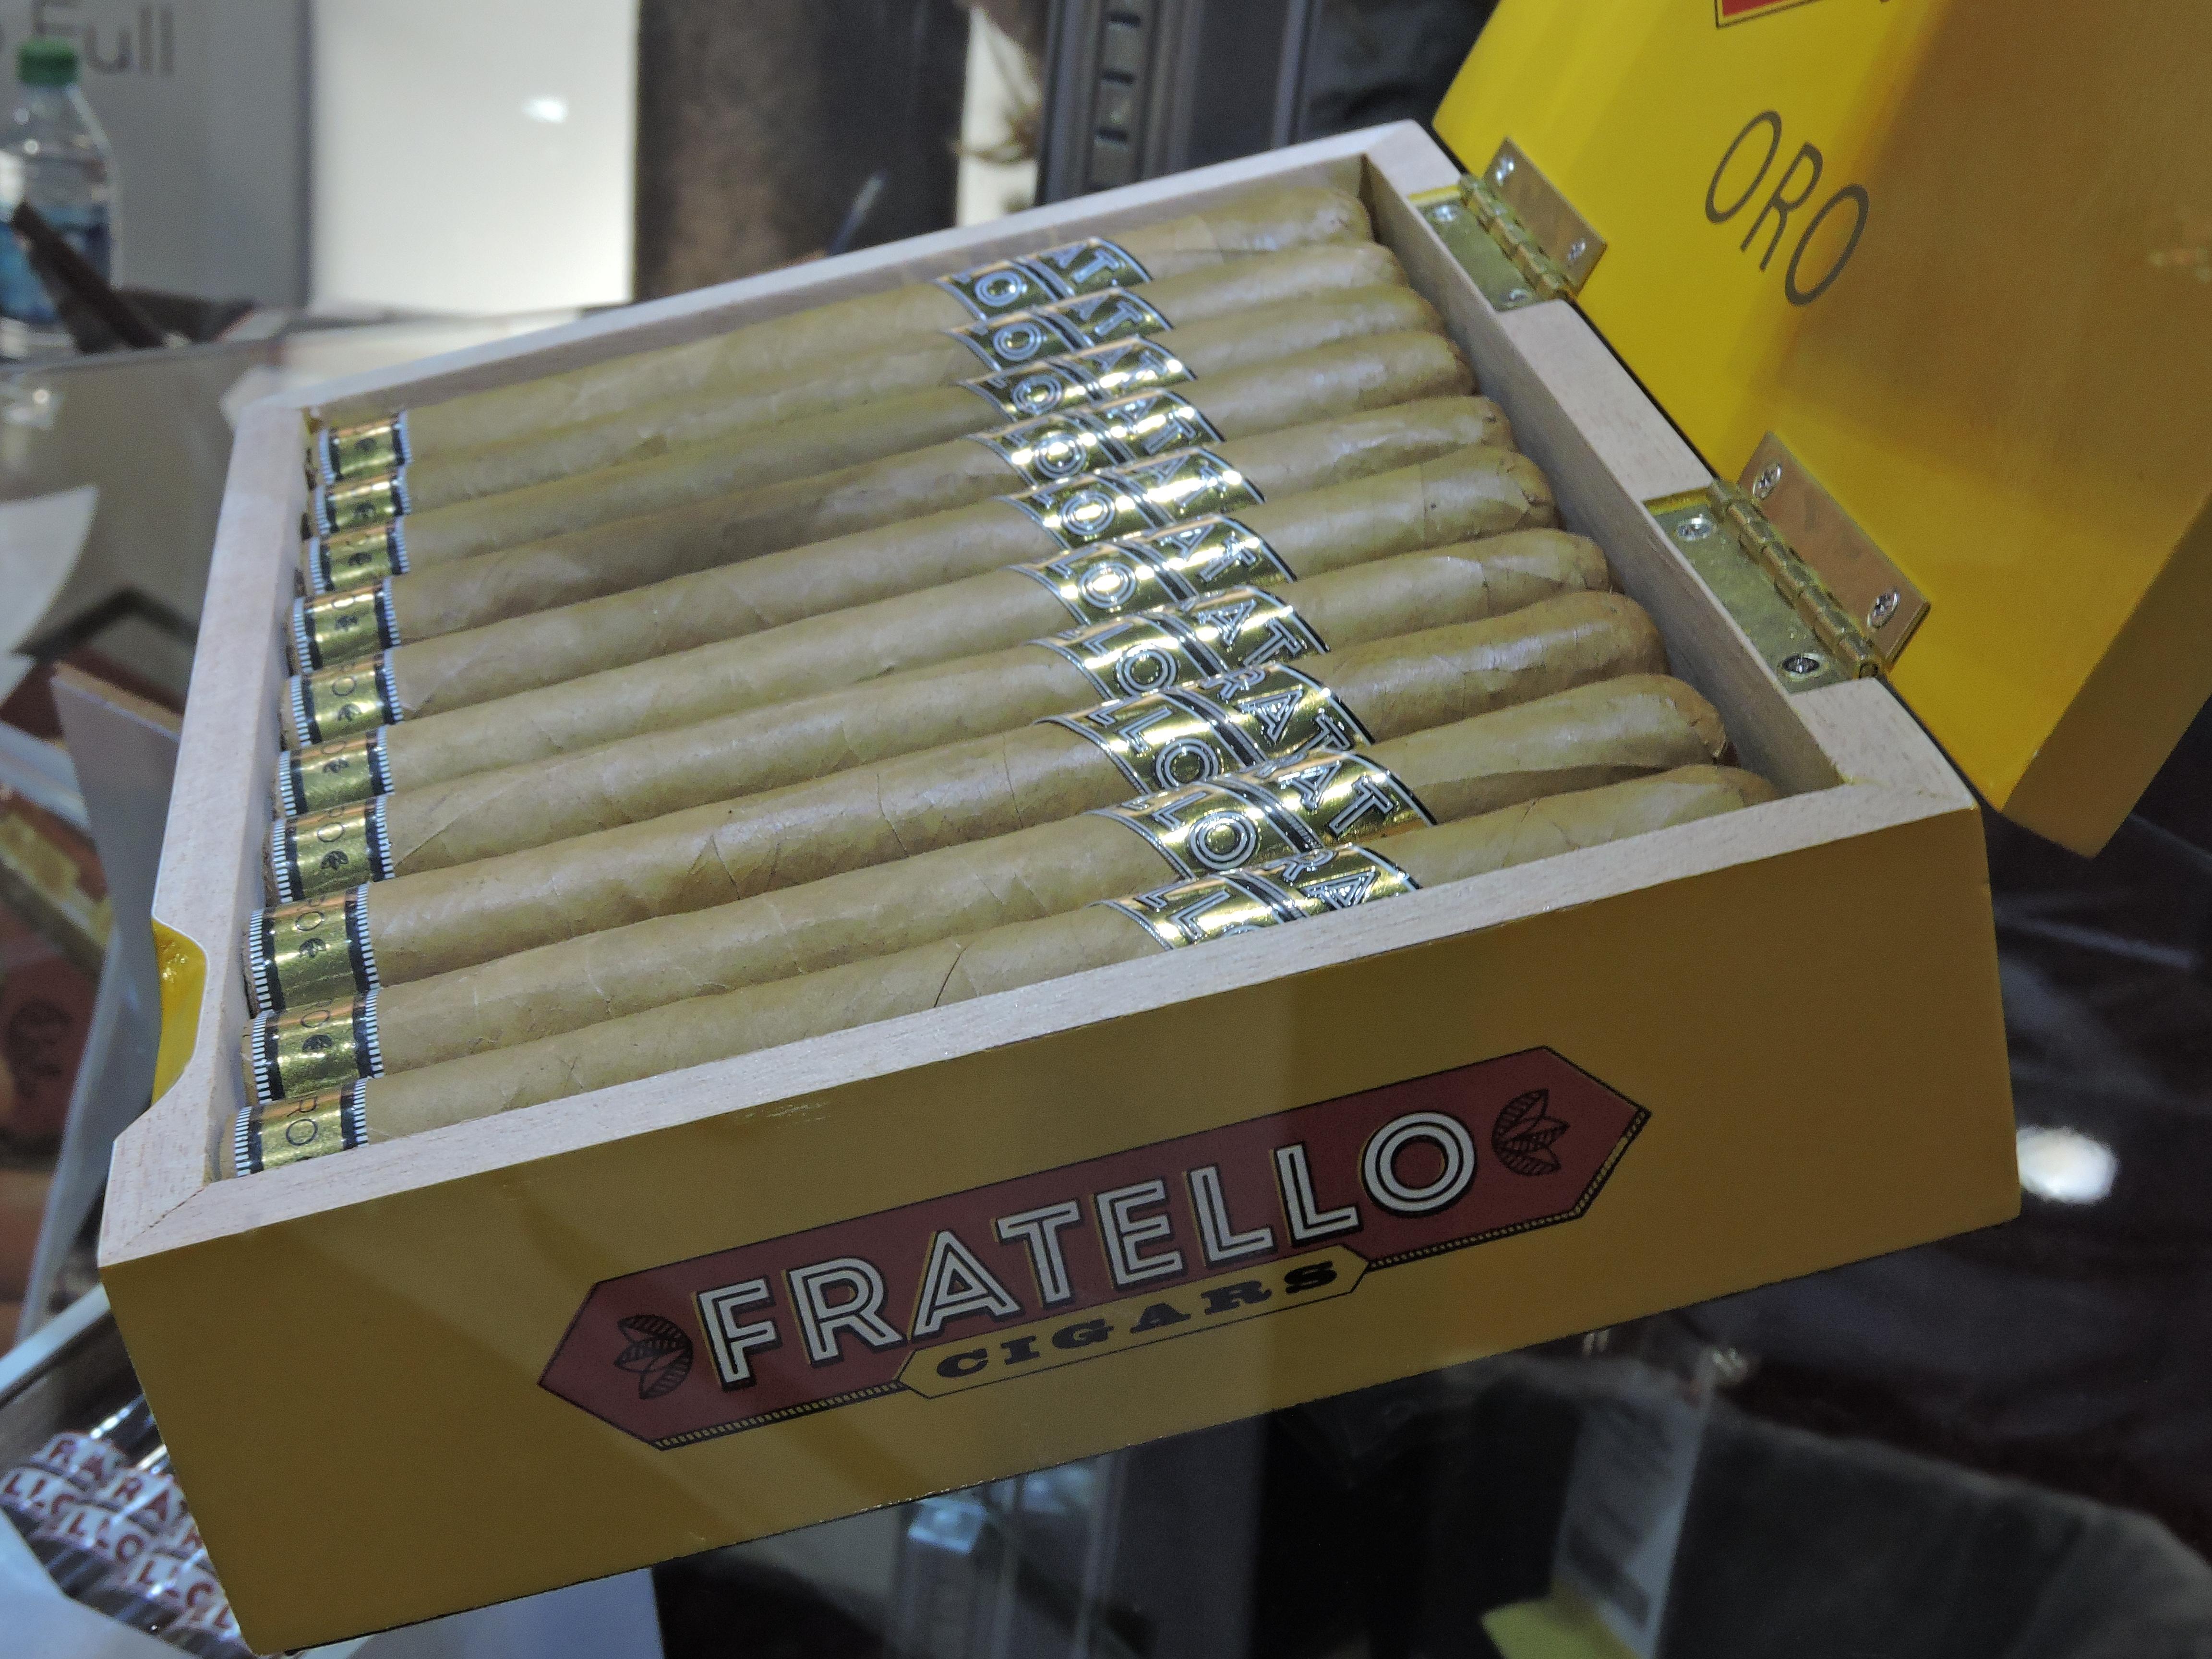 Fratello_Oro_JPG